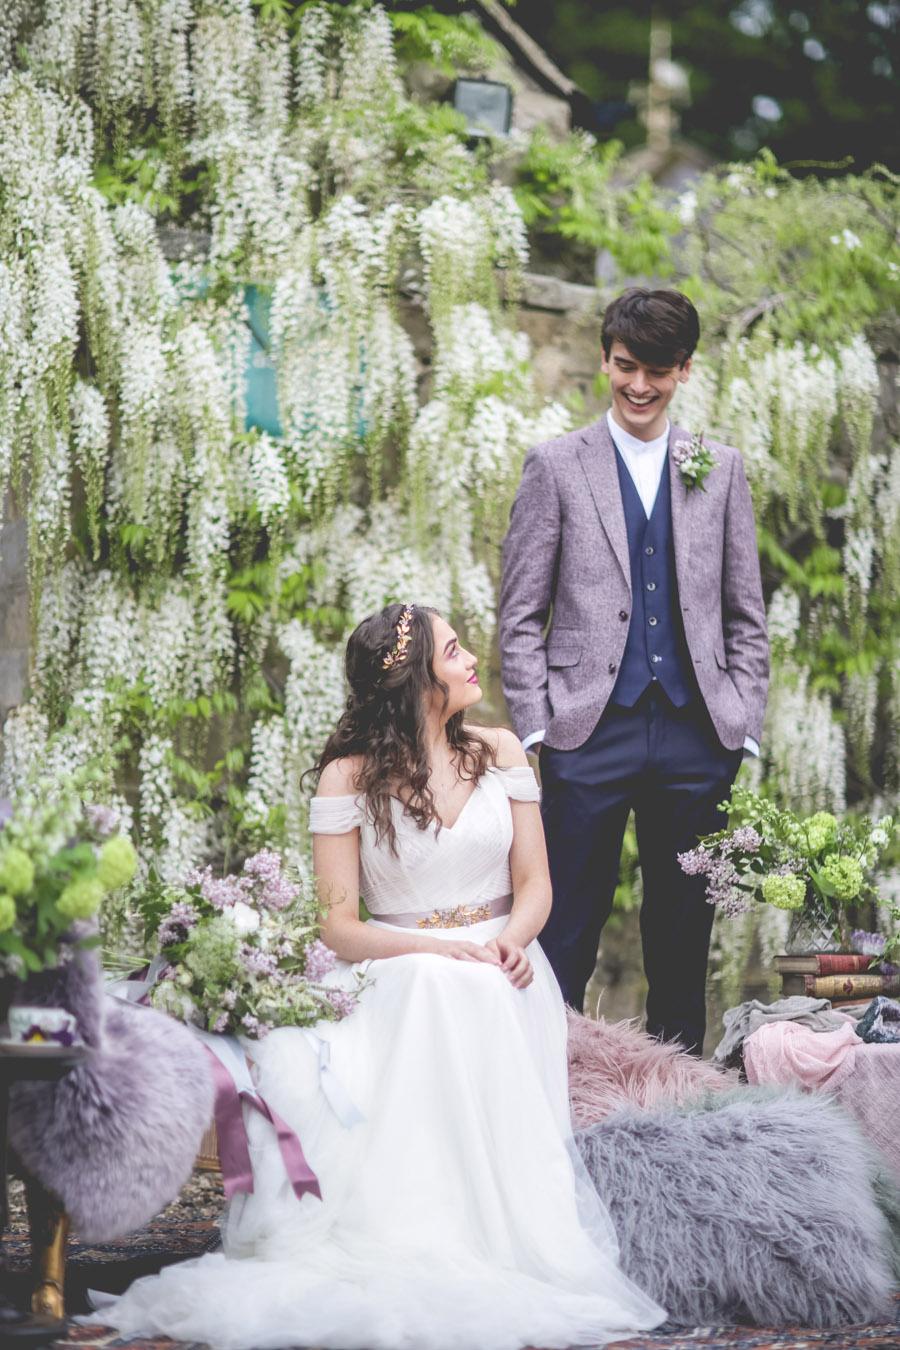 Eshott Hall wedding inspiration, credit Sean Elliott Photography (5)